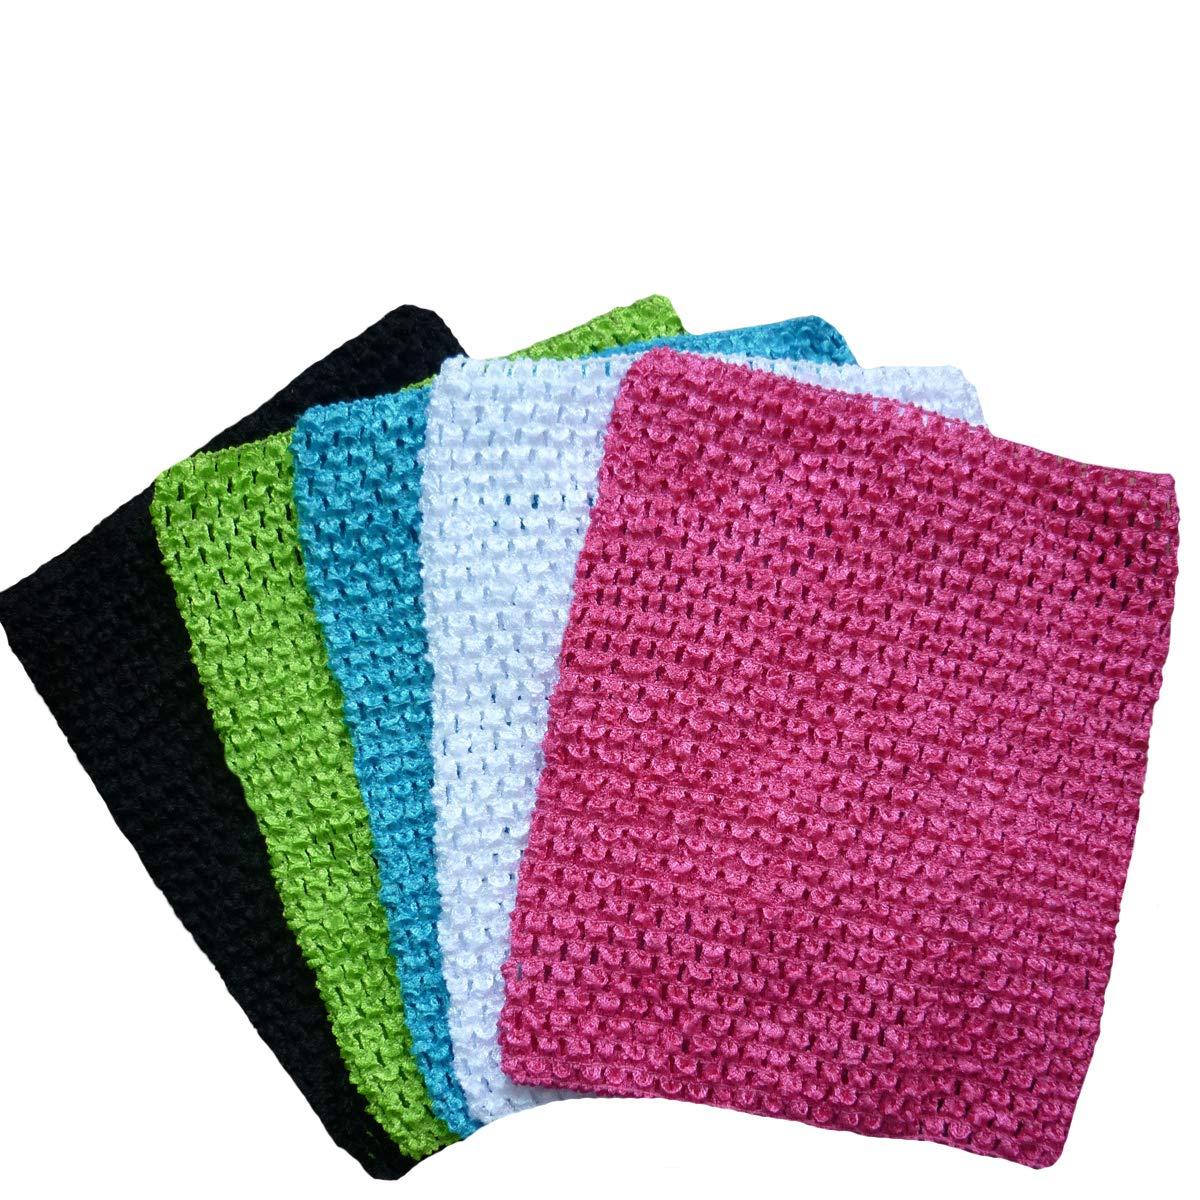 b27399bf403 Amazon.com  KADIWOW Crochet Tutu Tops